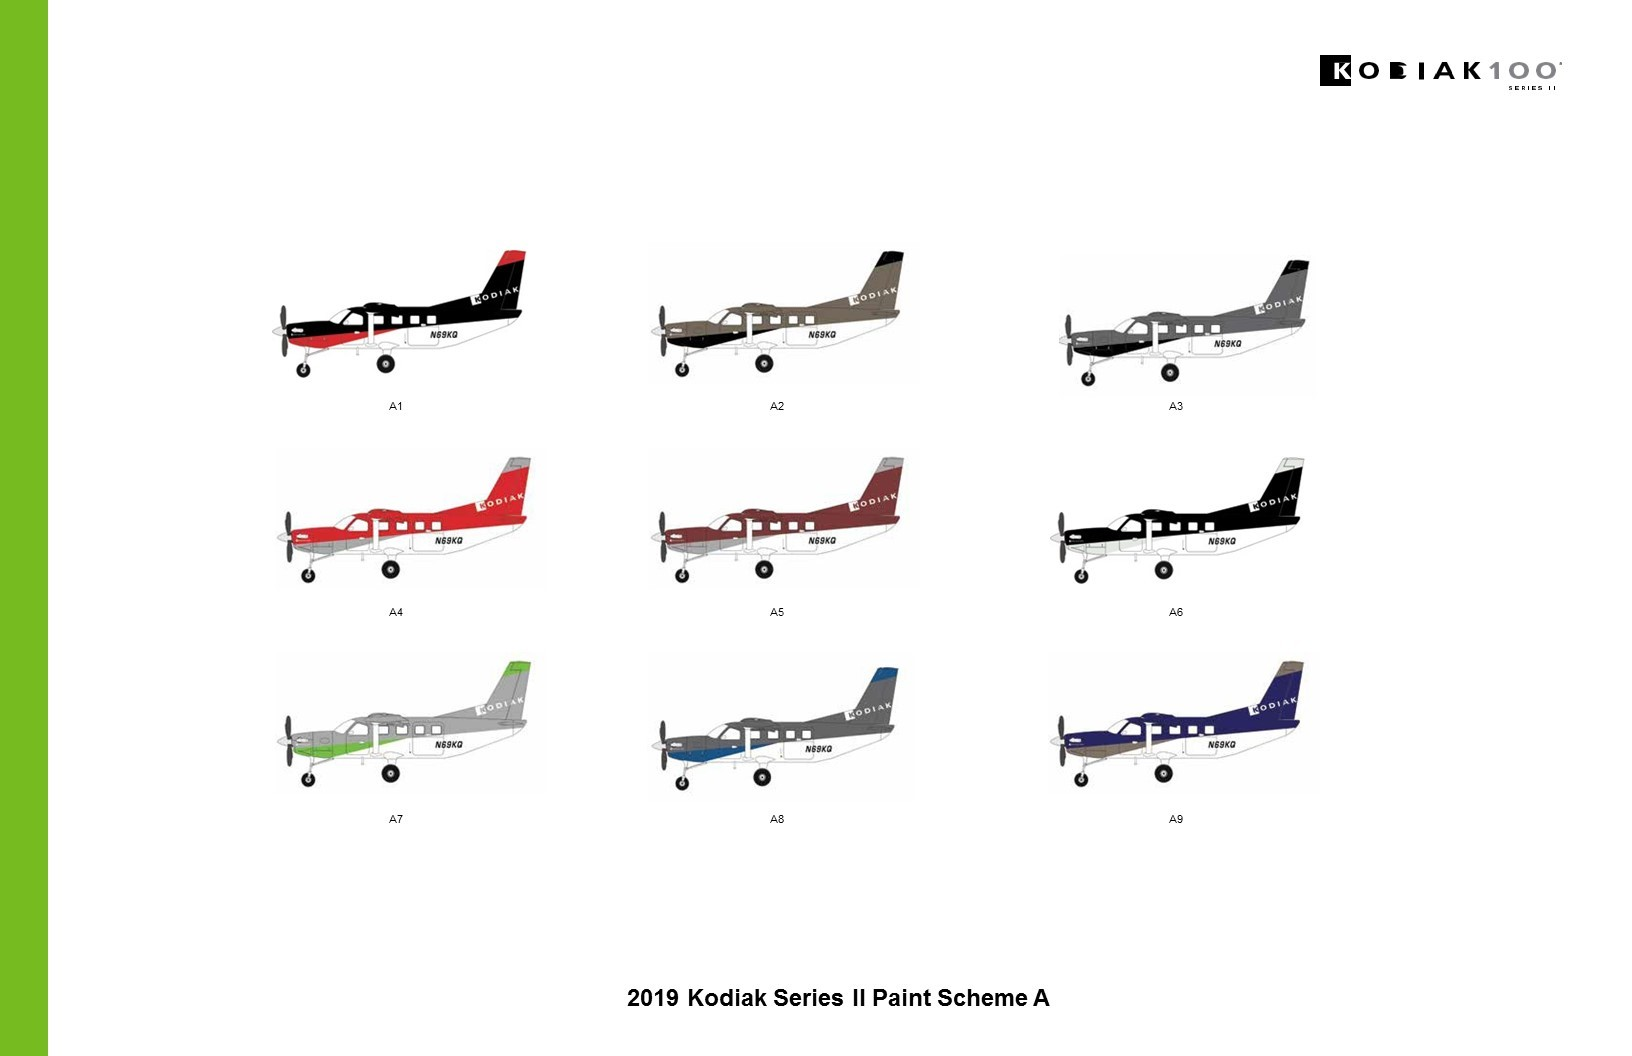 qk series ii scheme a